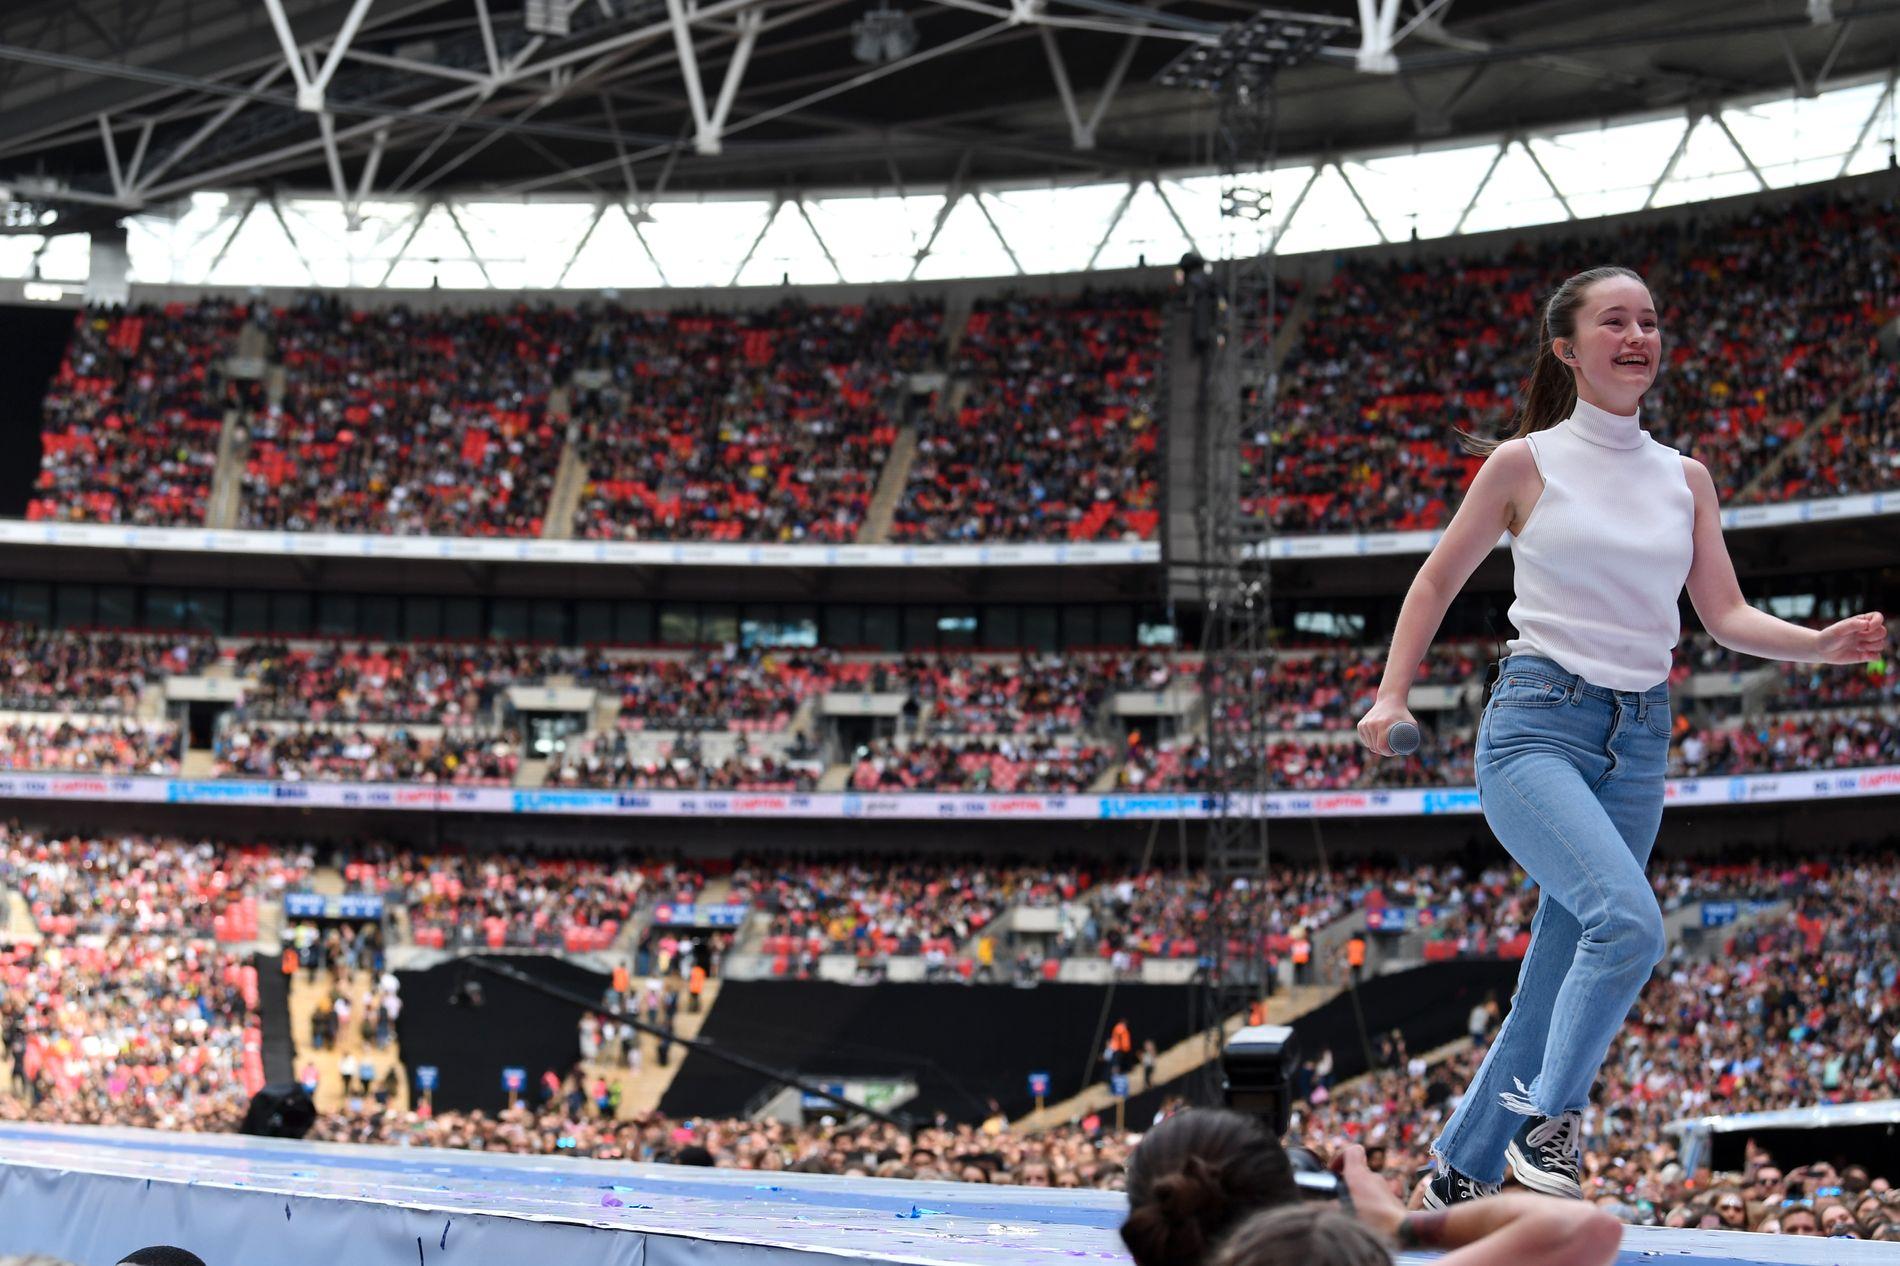 SPILTE FOR 80.000: Sigrid underholdt en fullstappet Wembley stadion i London 8. juni, under radiokanalen Capital FMs popfestival.